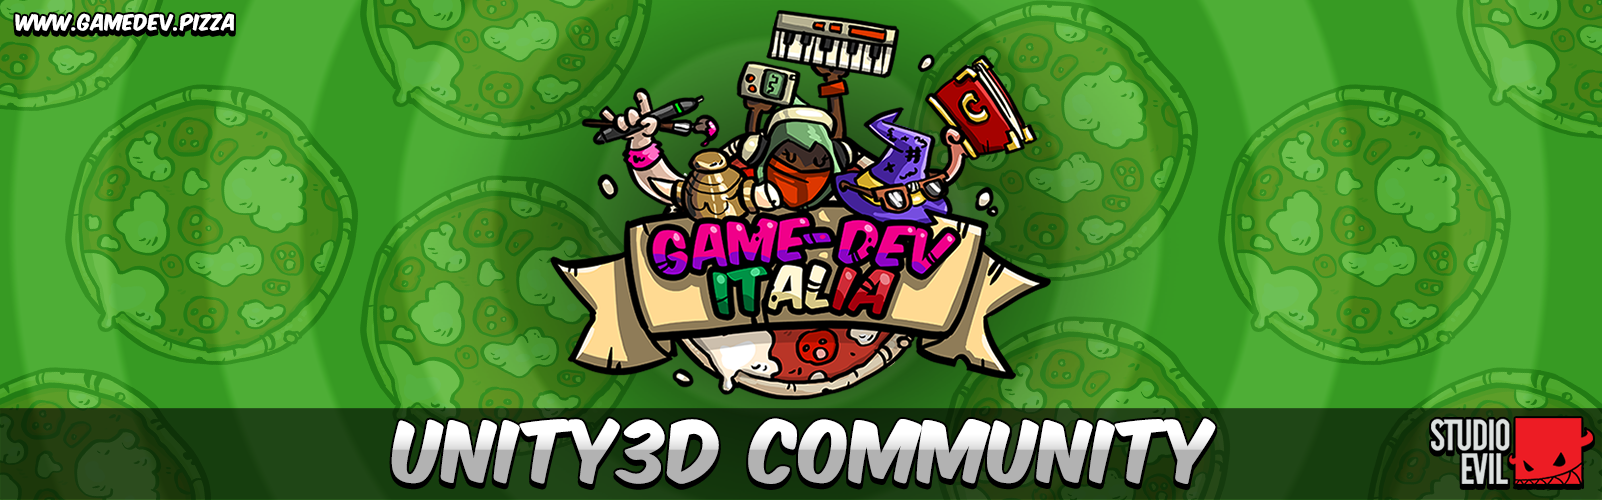 gamedev_italia_banner__0002_unity-noob